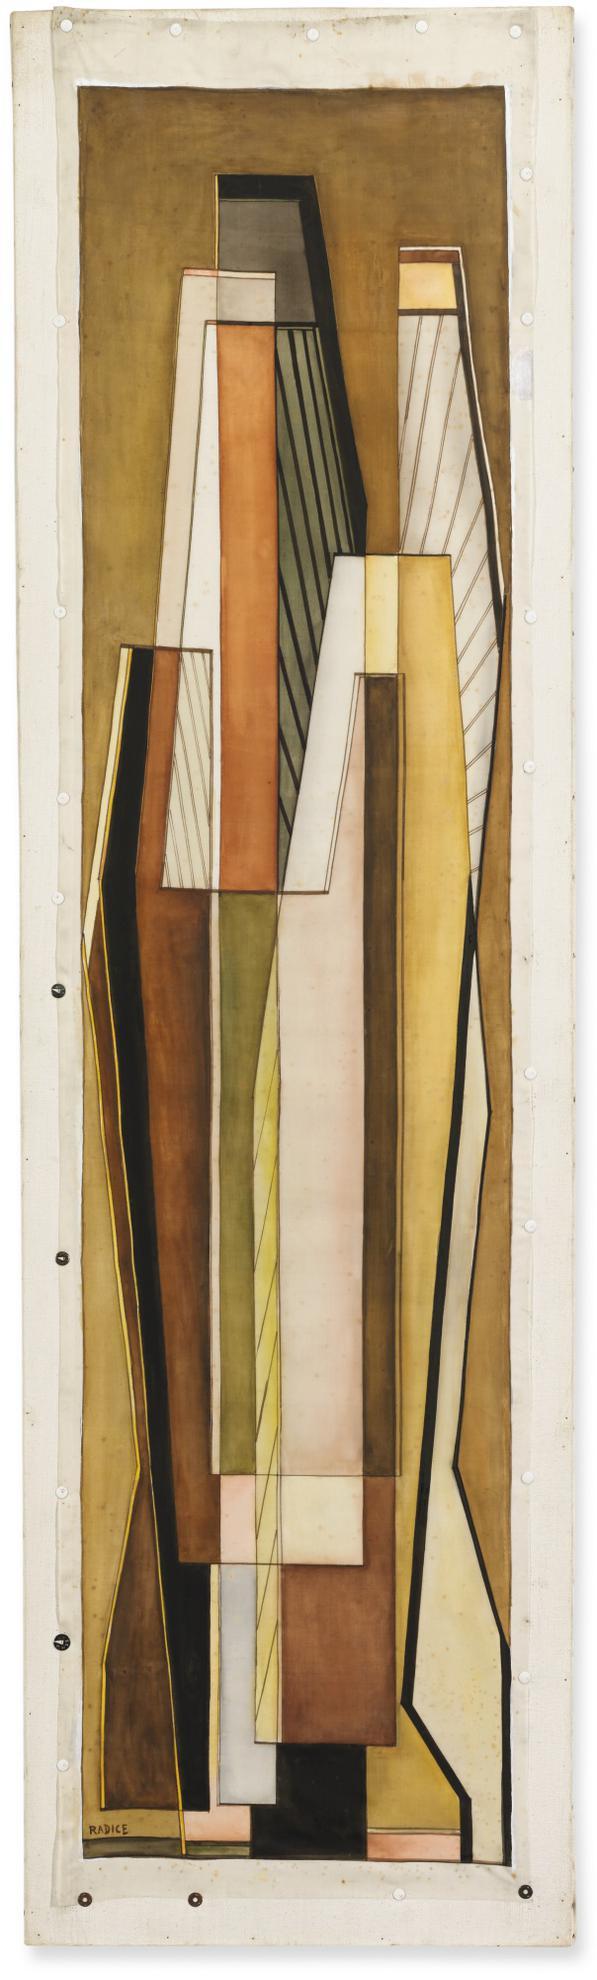 Mario Radice-Composizione R. S.-1961